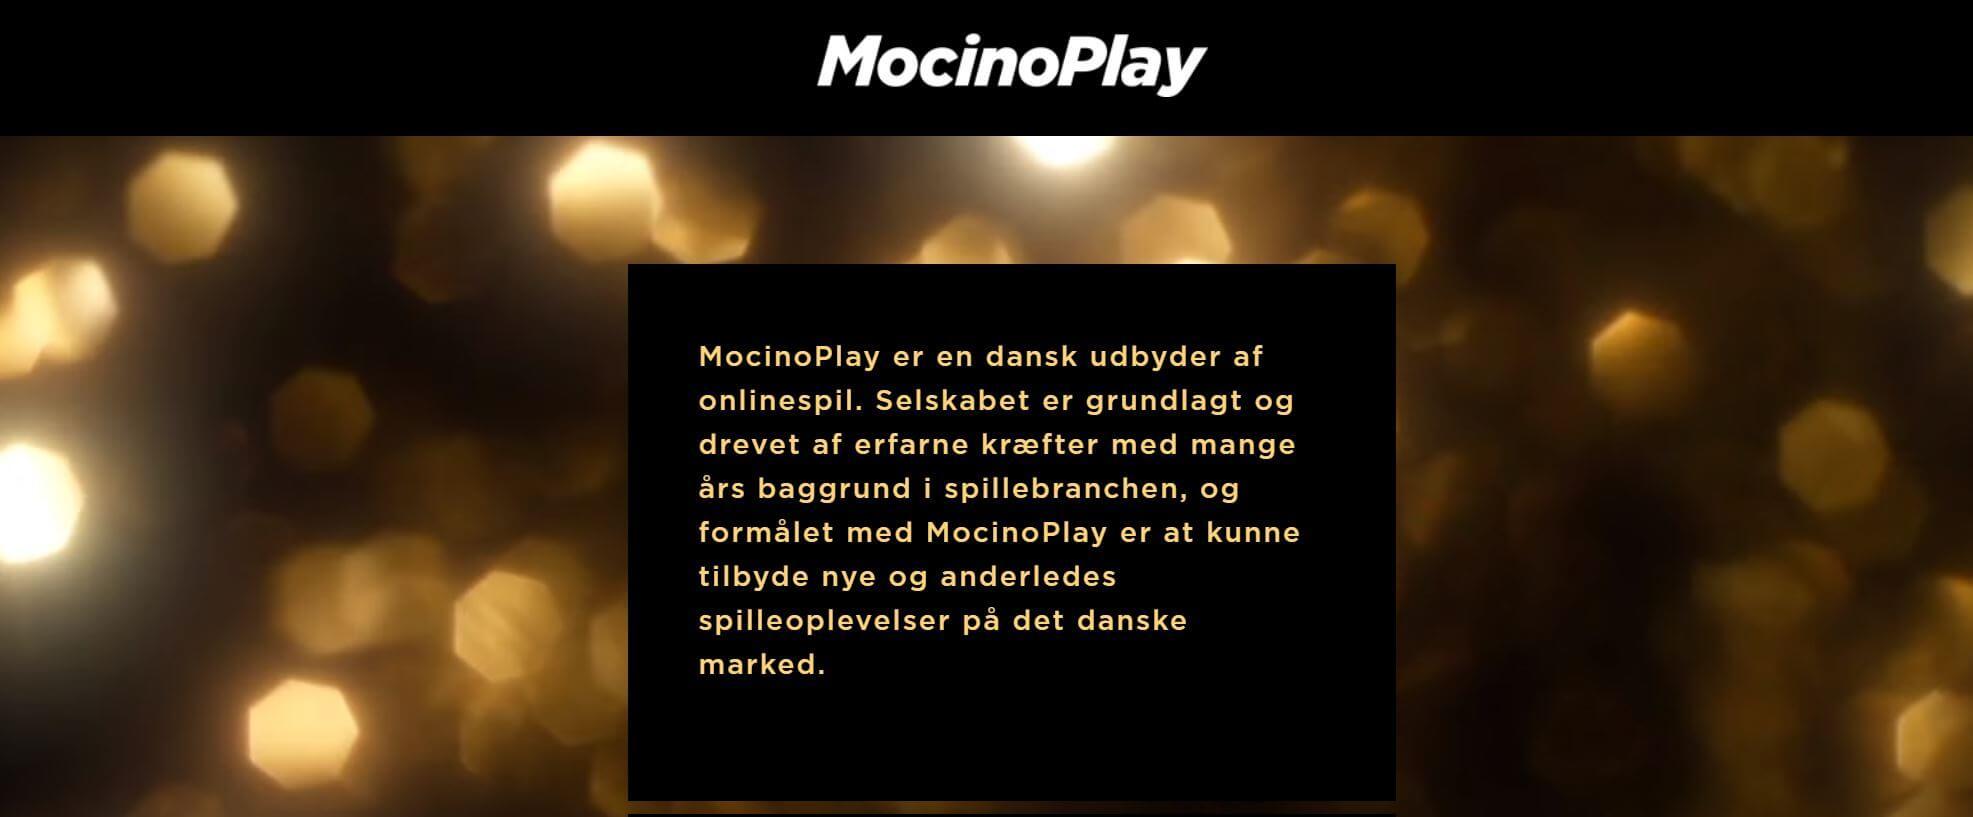 MocinoPlay